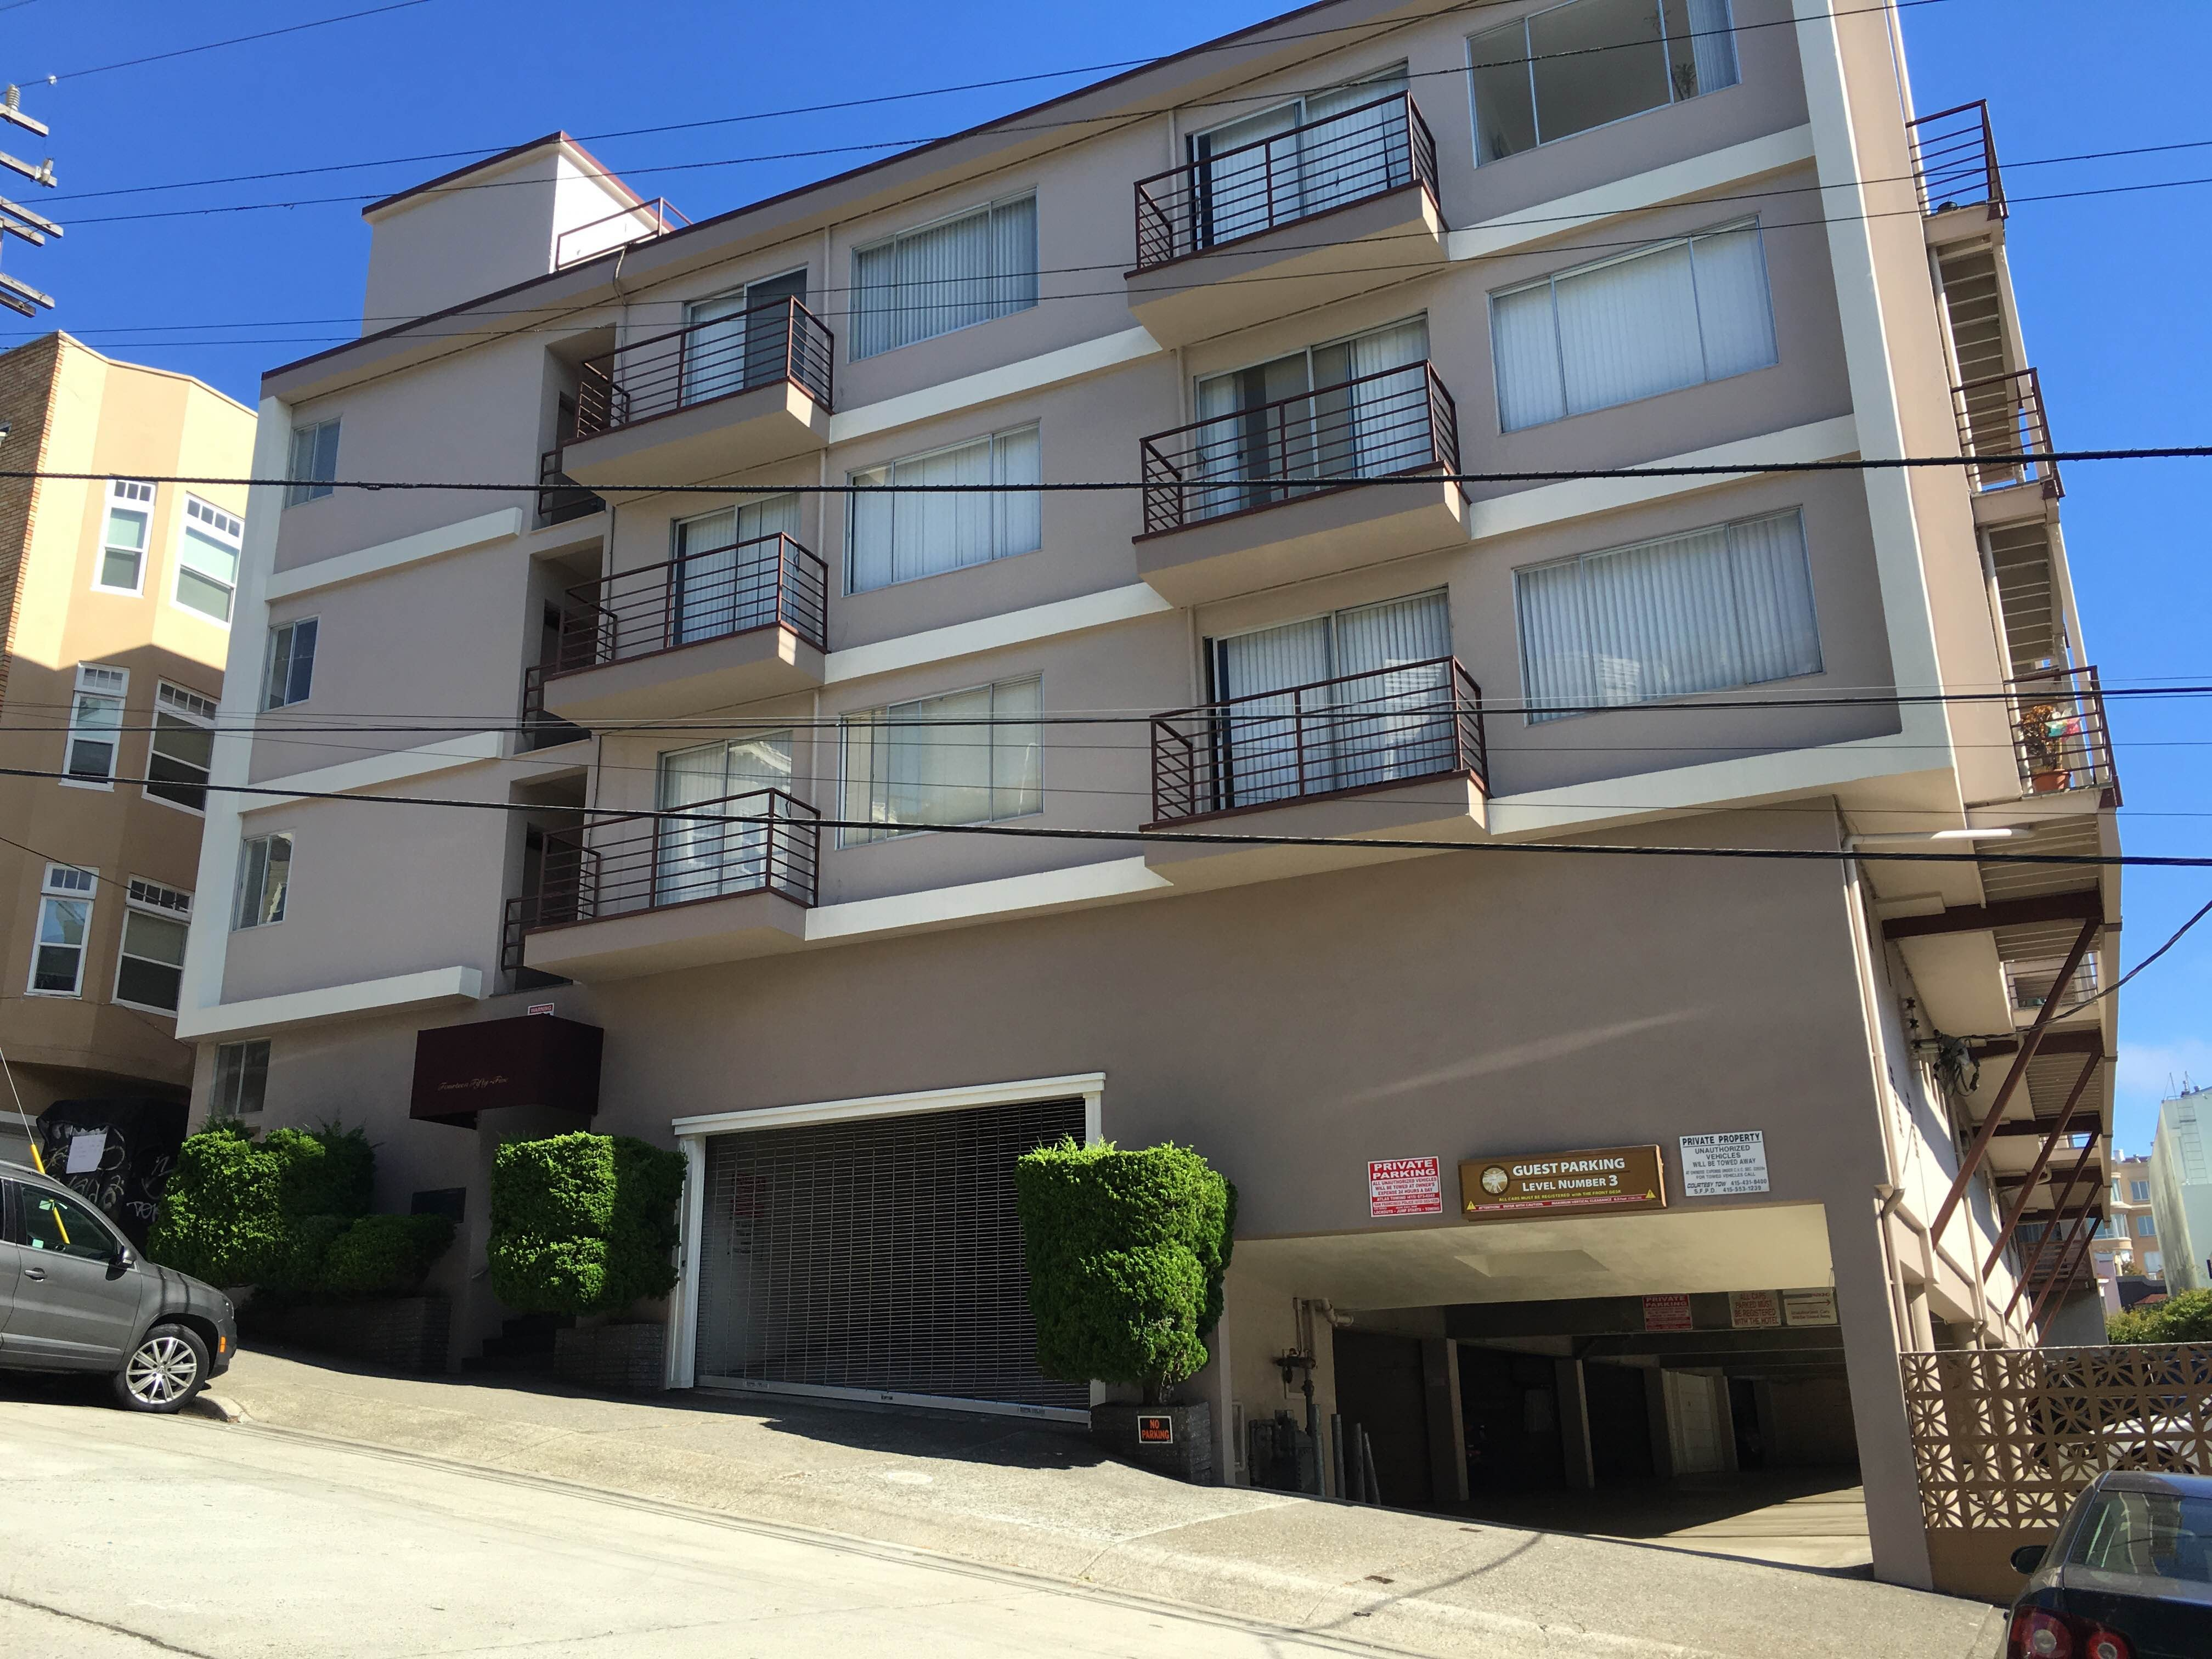 1455 filbert street san francisco ca 94109 1 bedroom - San francisco one bedroom apartment ...